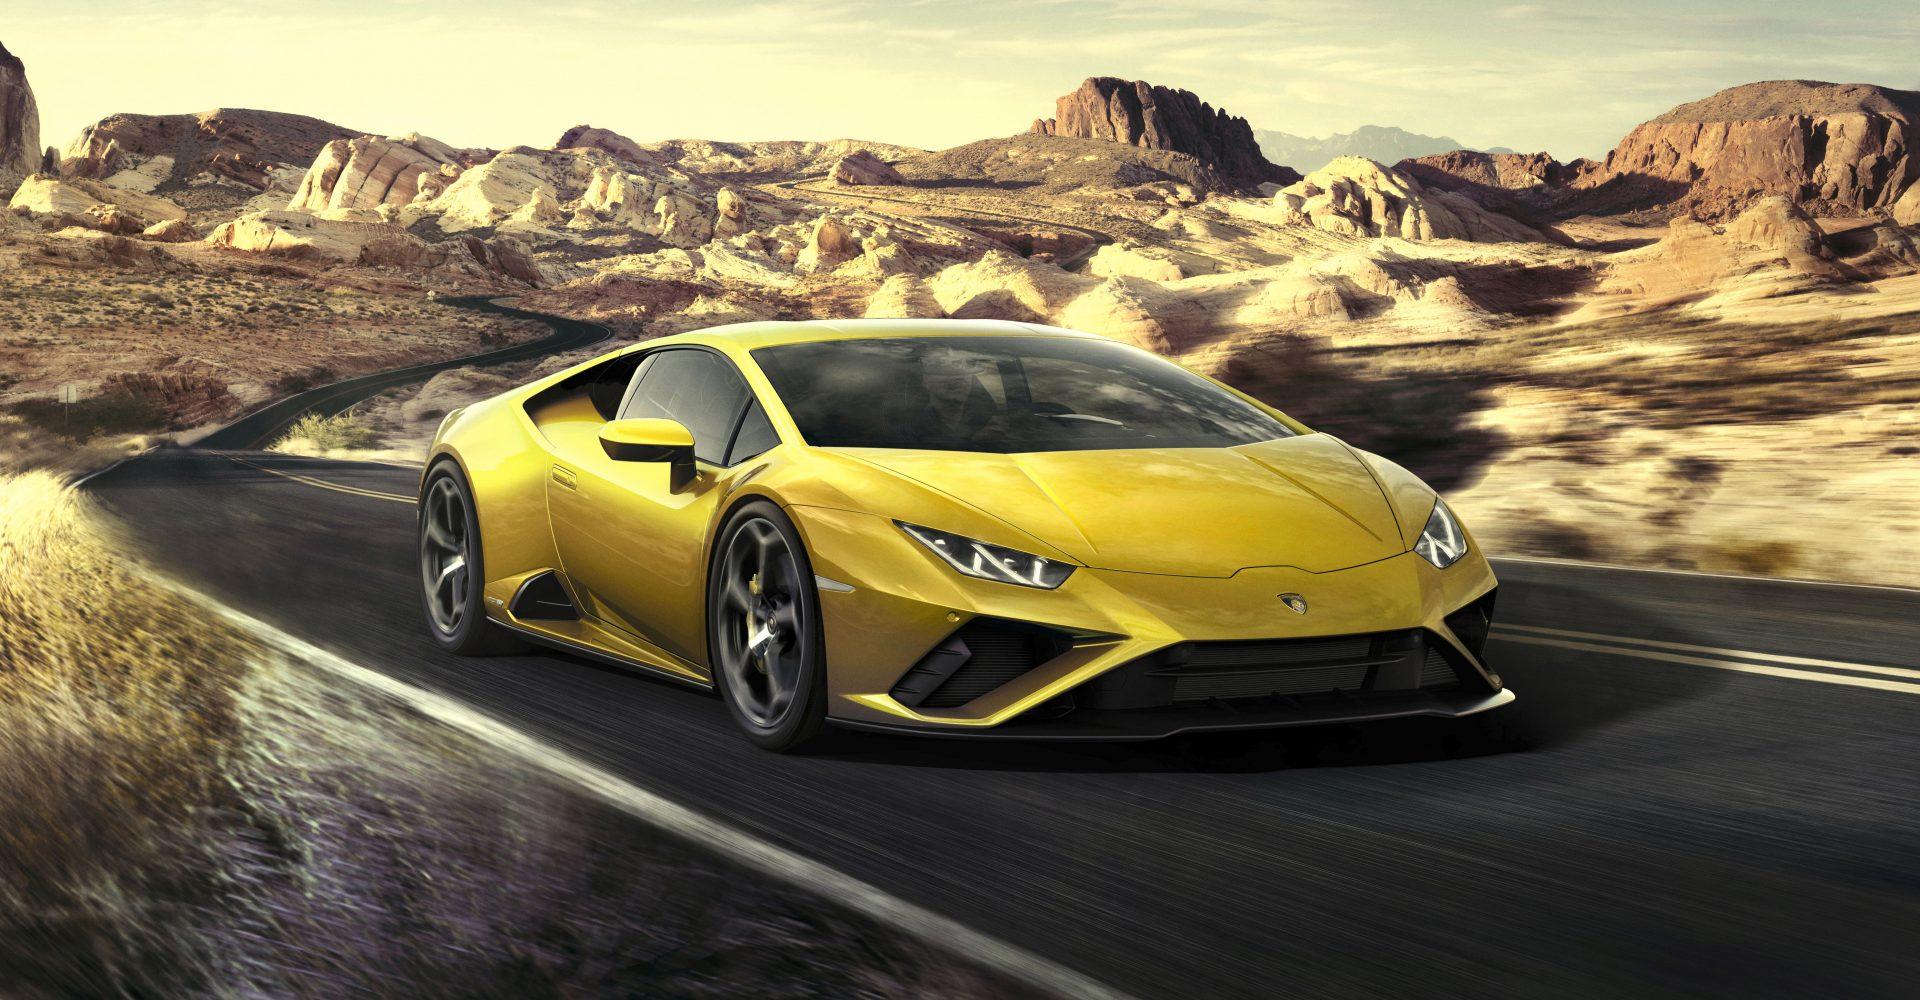 First Drive: The Lamborghini Huracan Evo RWD brings theatre and performance